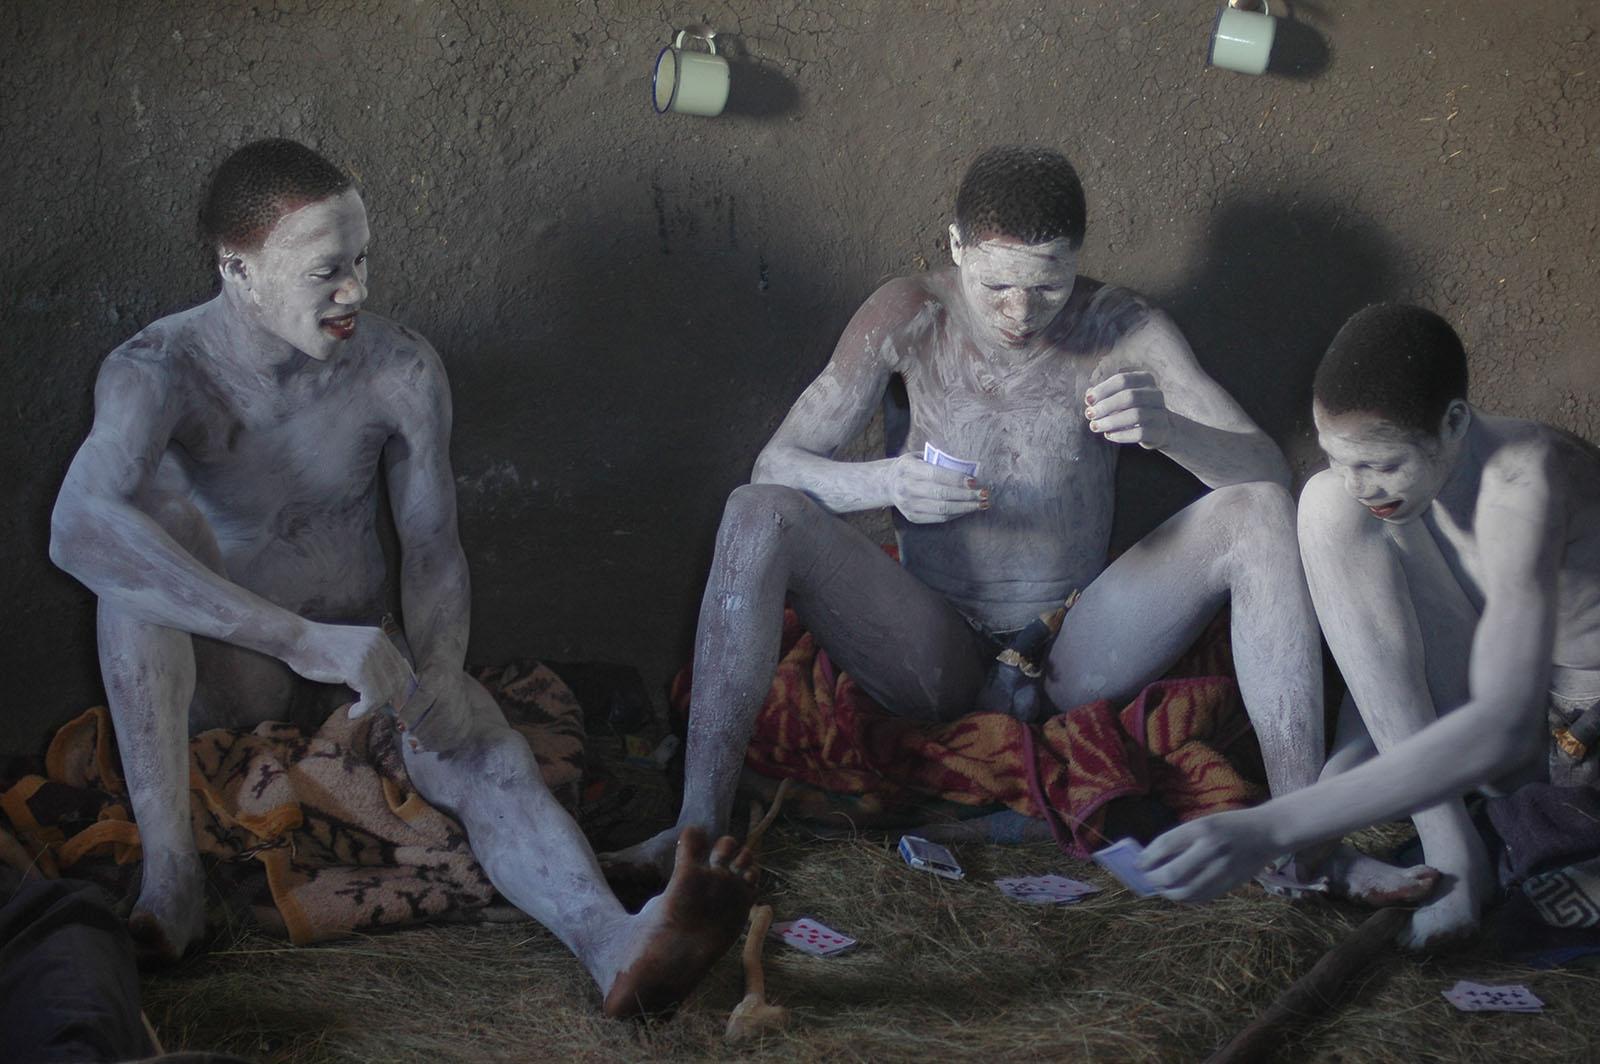 Fotografie Zuid-Afrika - Wild Coast, zwarte mannen wit geschminkt spelen kaart in hut op de grond zittend